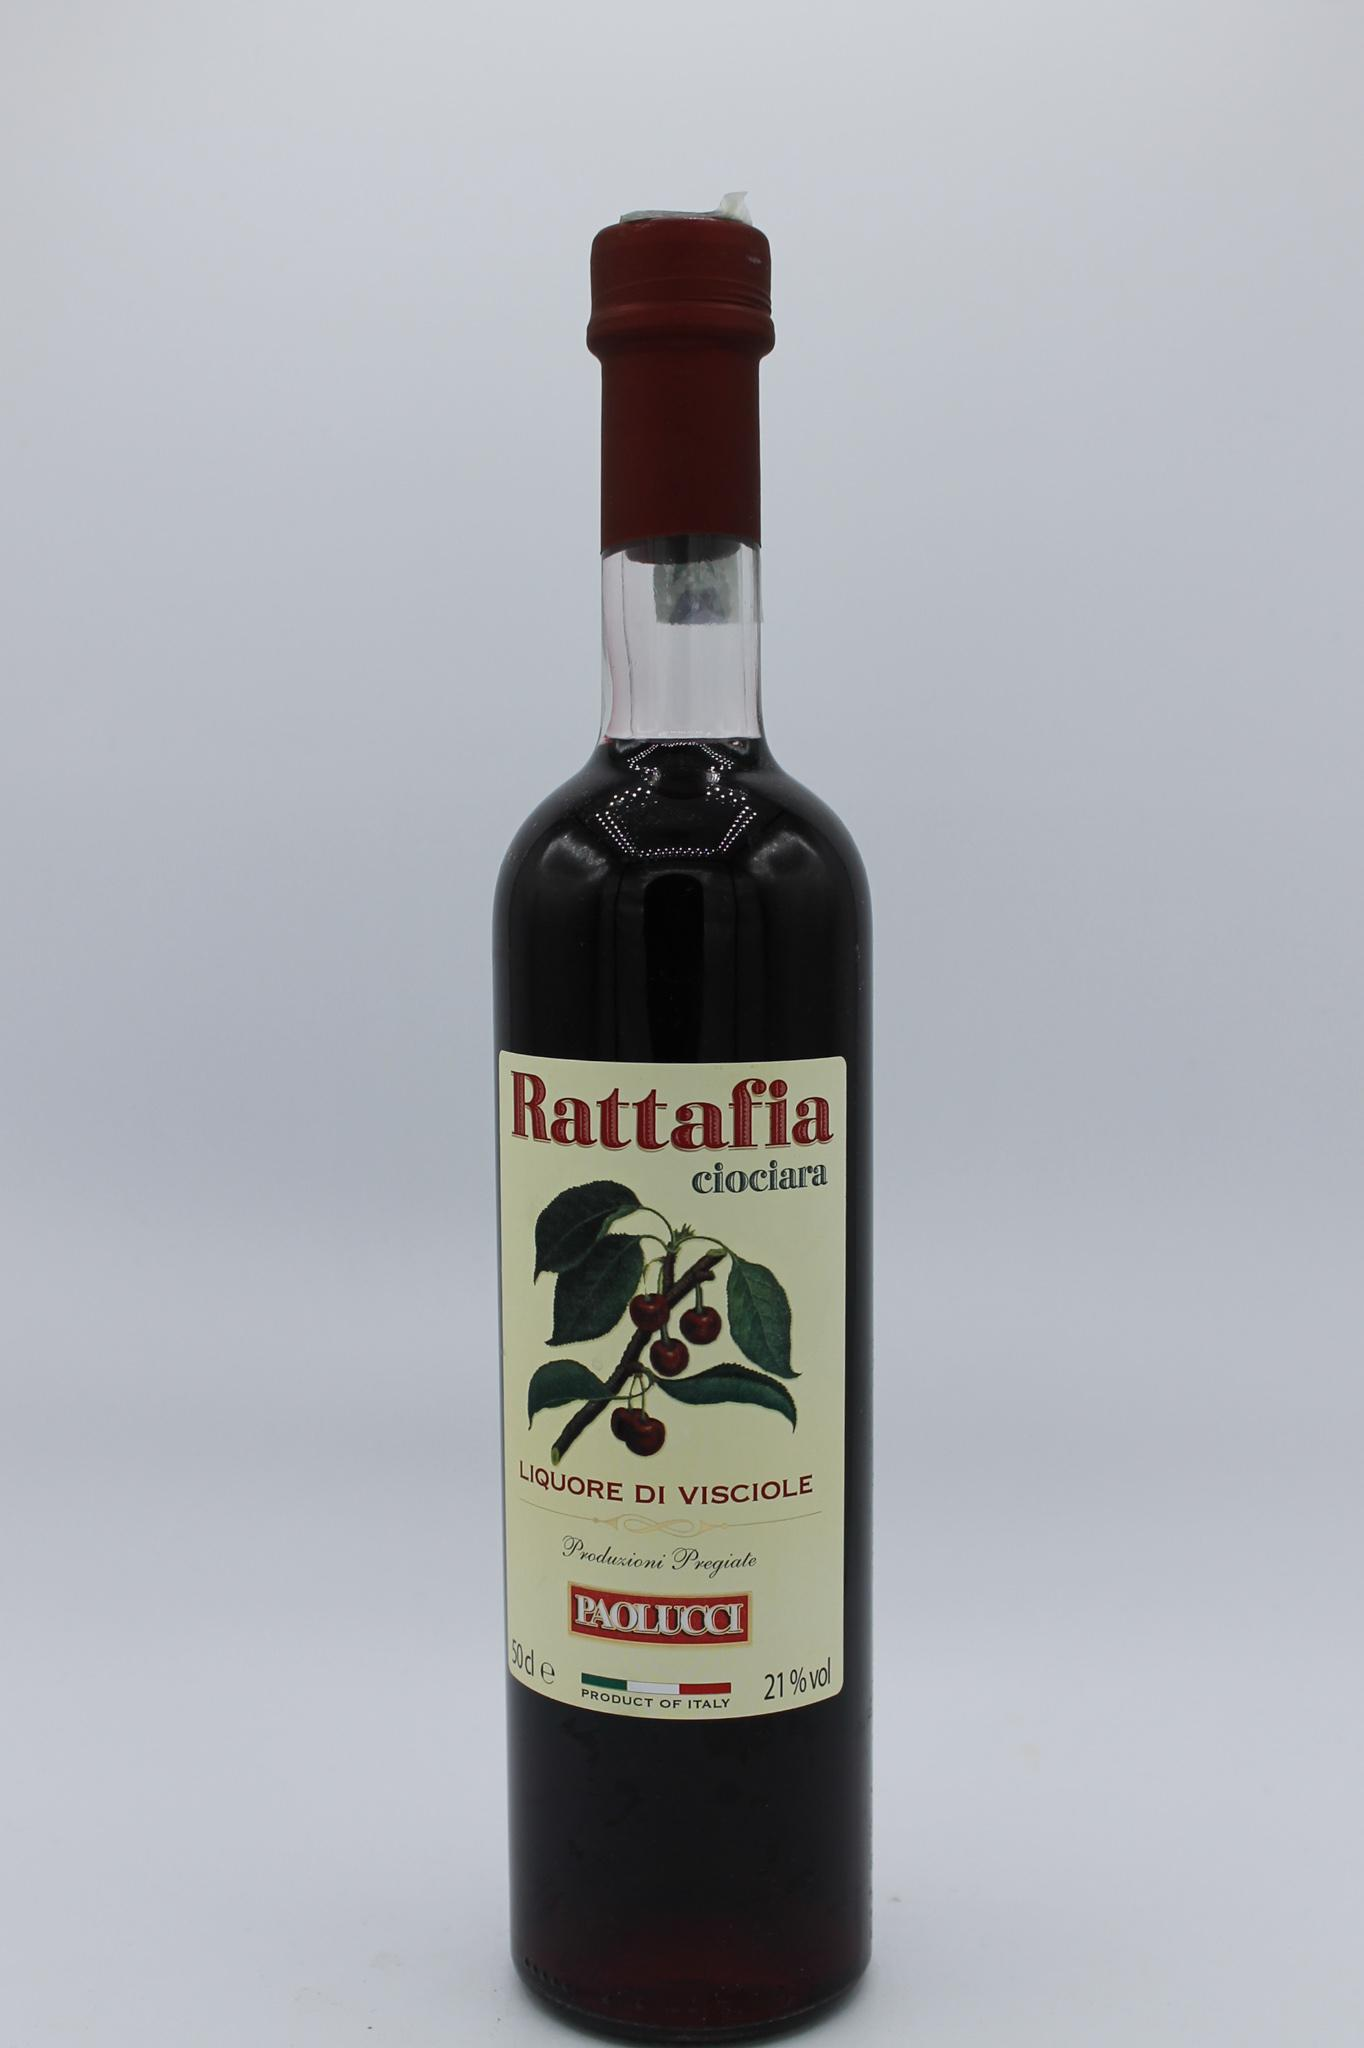 Paolucci liquore rattafia 500ml.